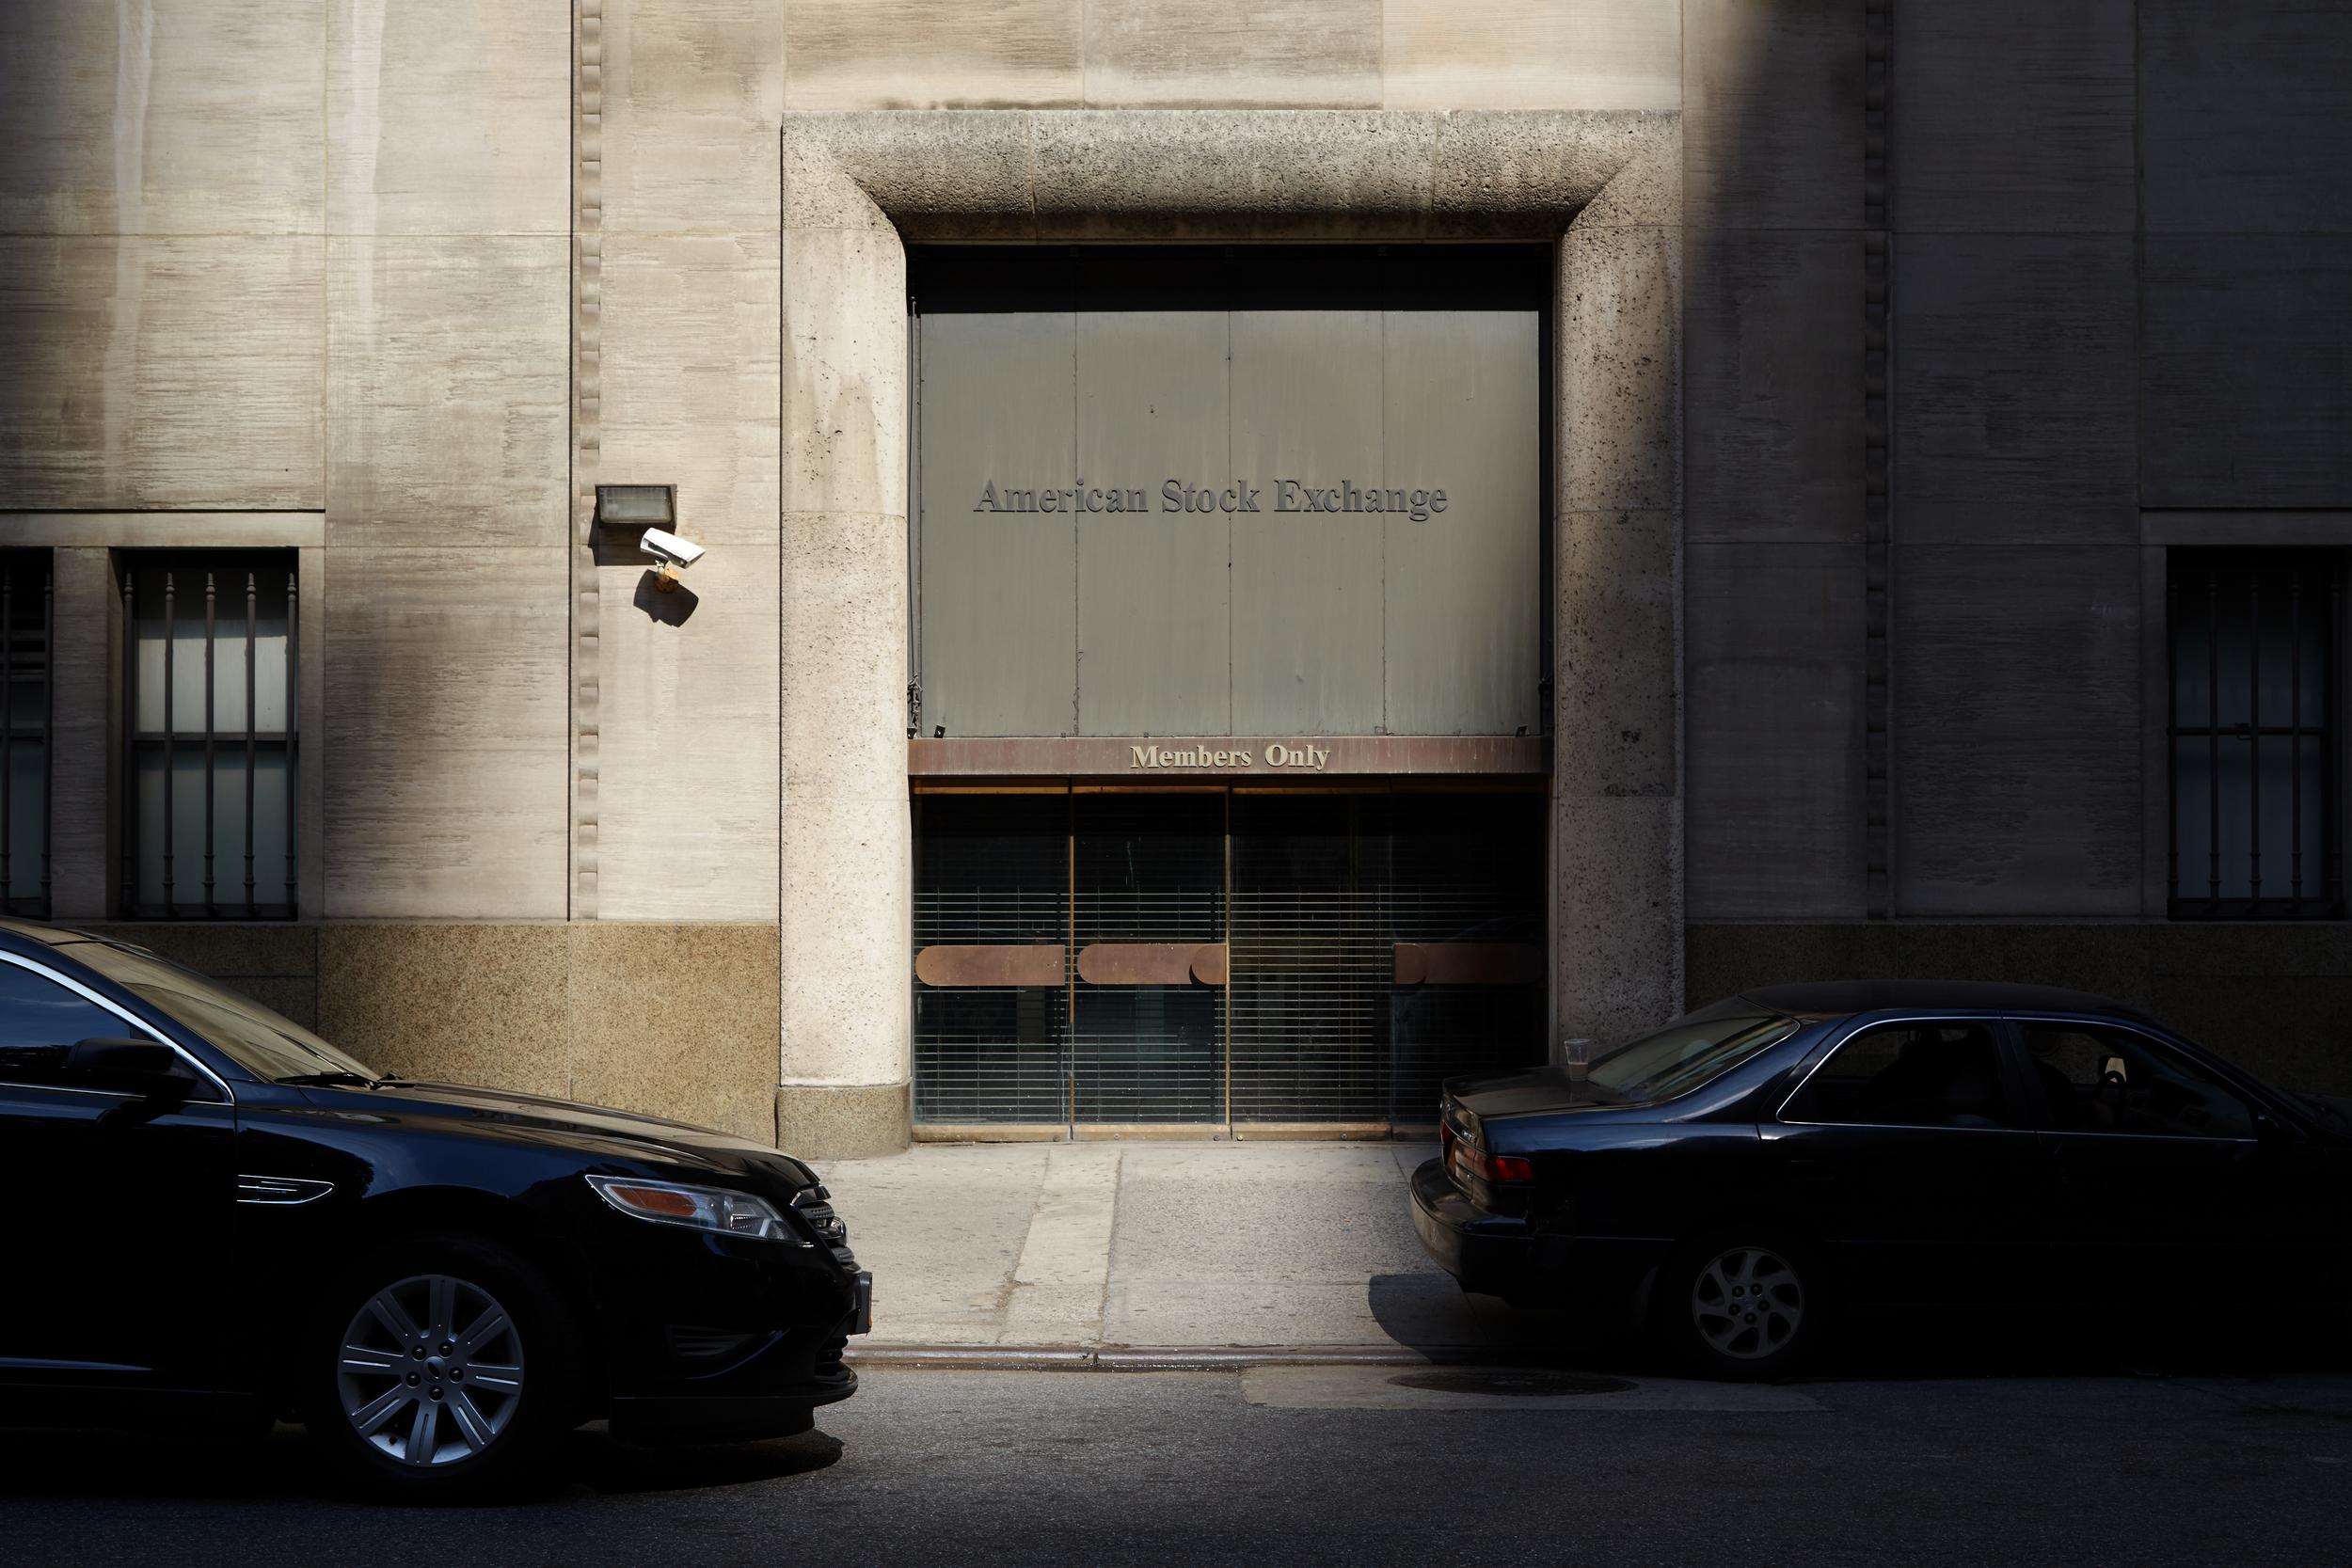 American Stock Exchange.jpg